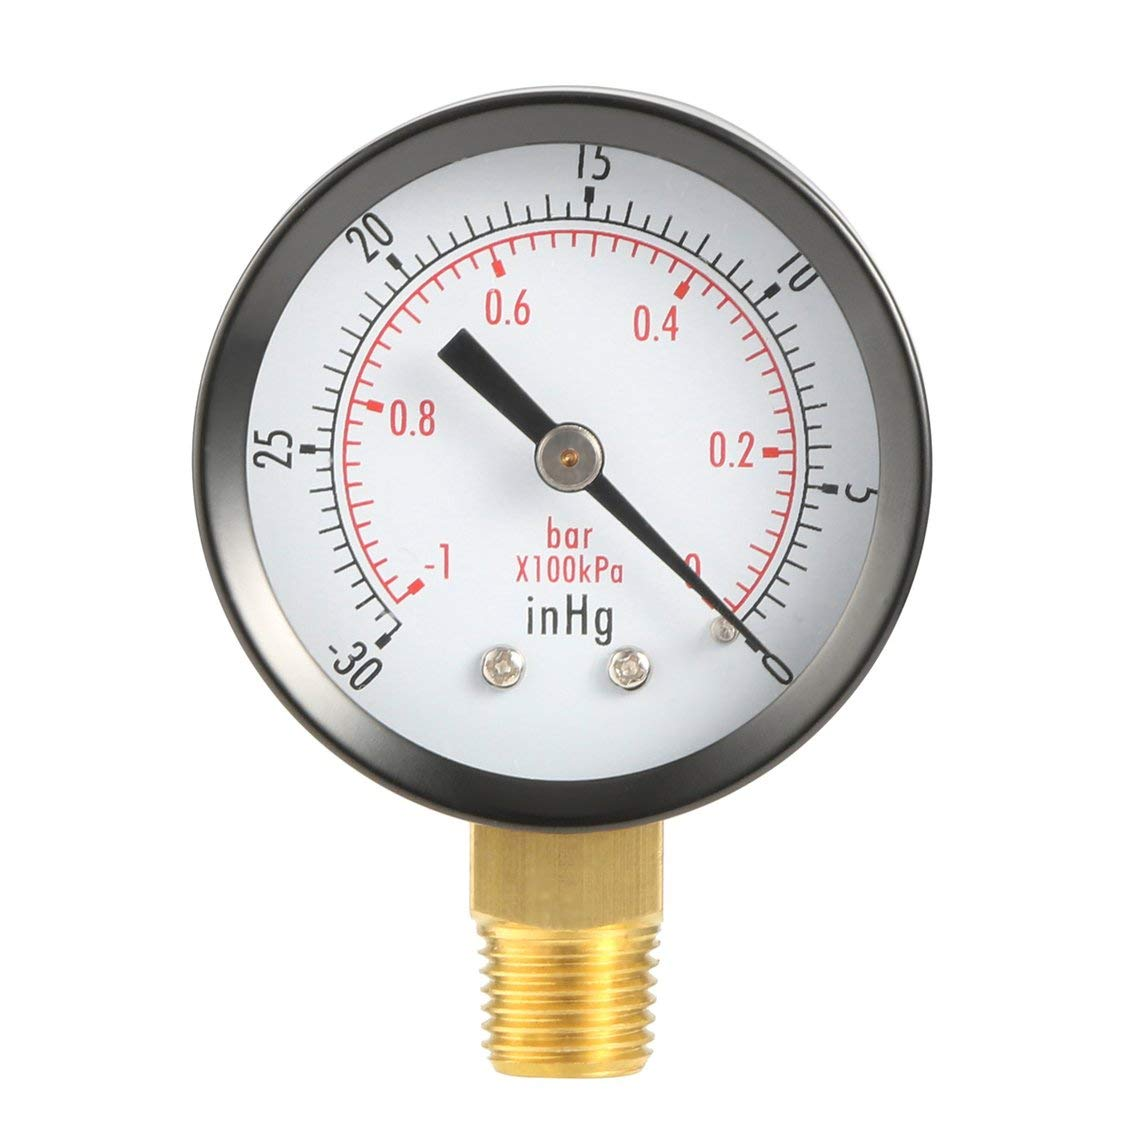 Dry Utility Vakuum Manometer Blk Stahl 1/4NPT Unterer Mount -30HG / 0PSI TS50-1 + 1 Brand New Kupferlegierung Dual Scale PSI Momorain